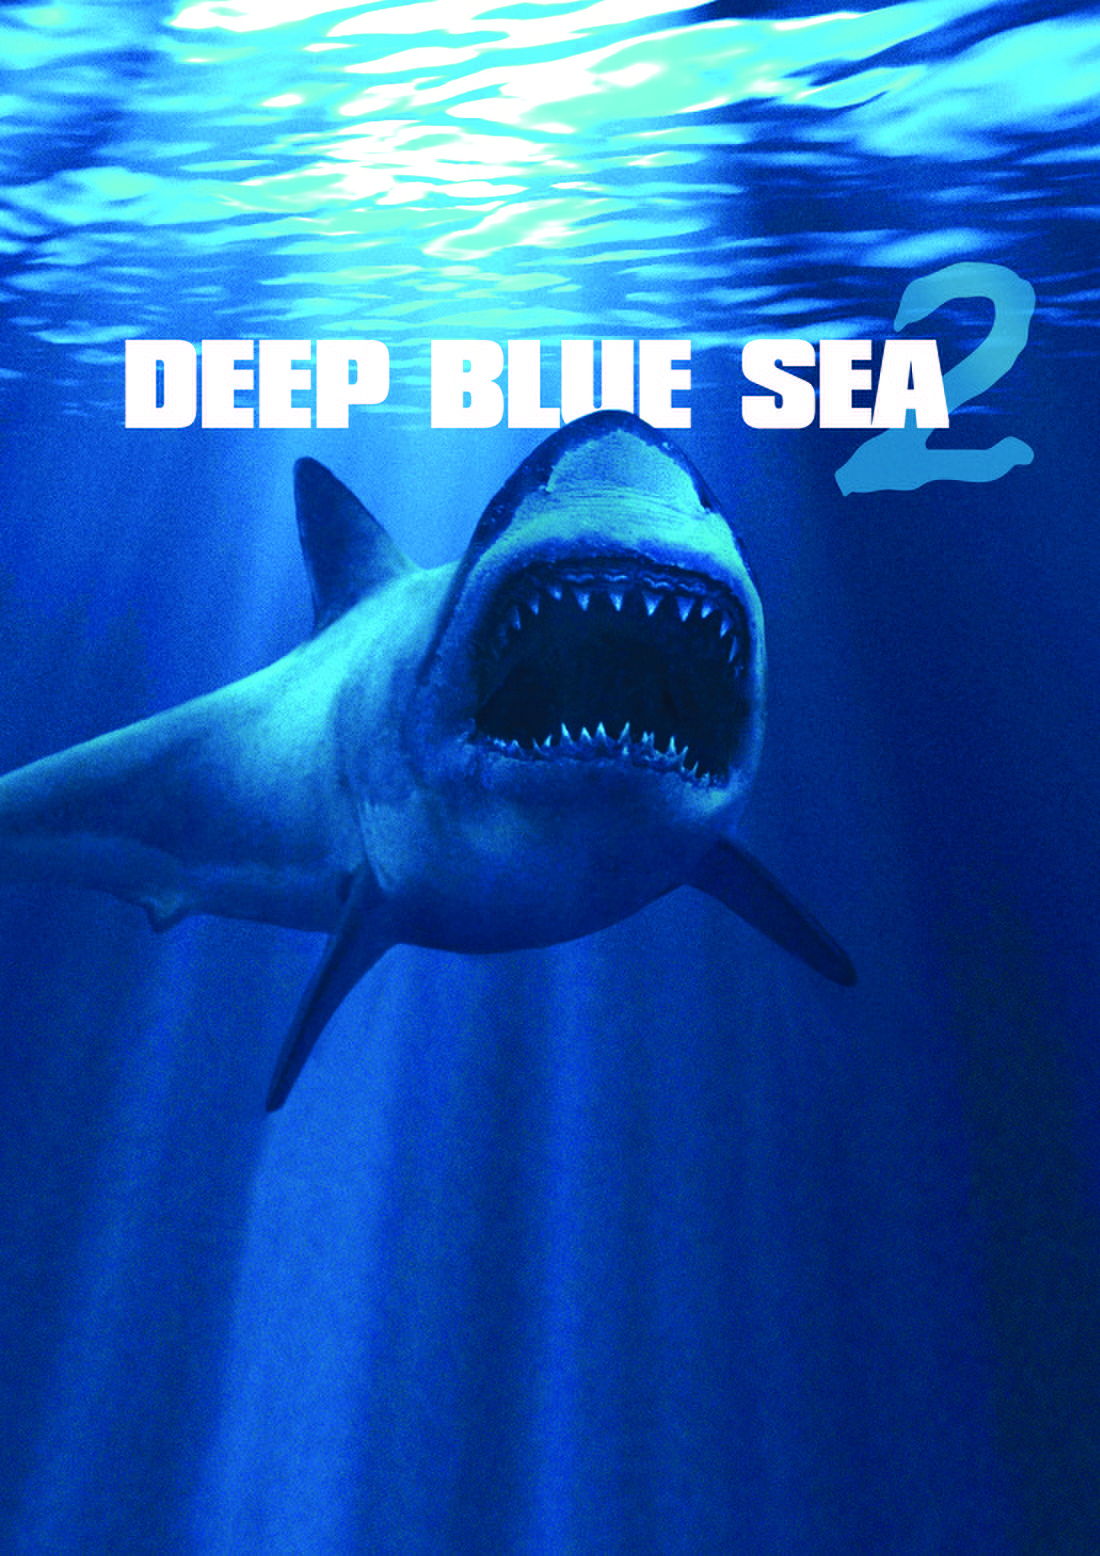 deep-blue-sea-2.jpg